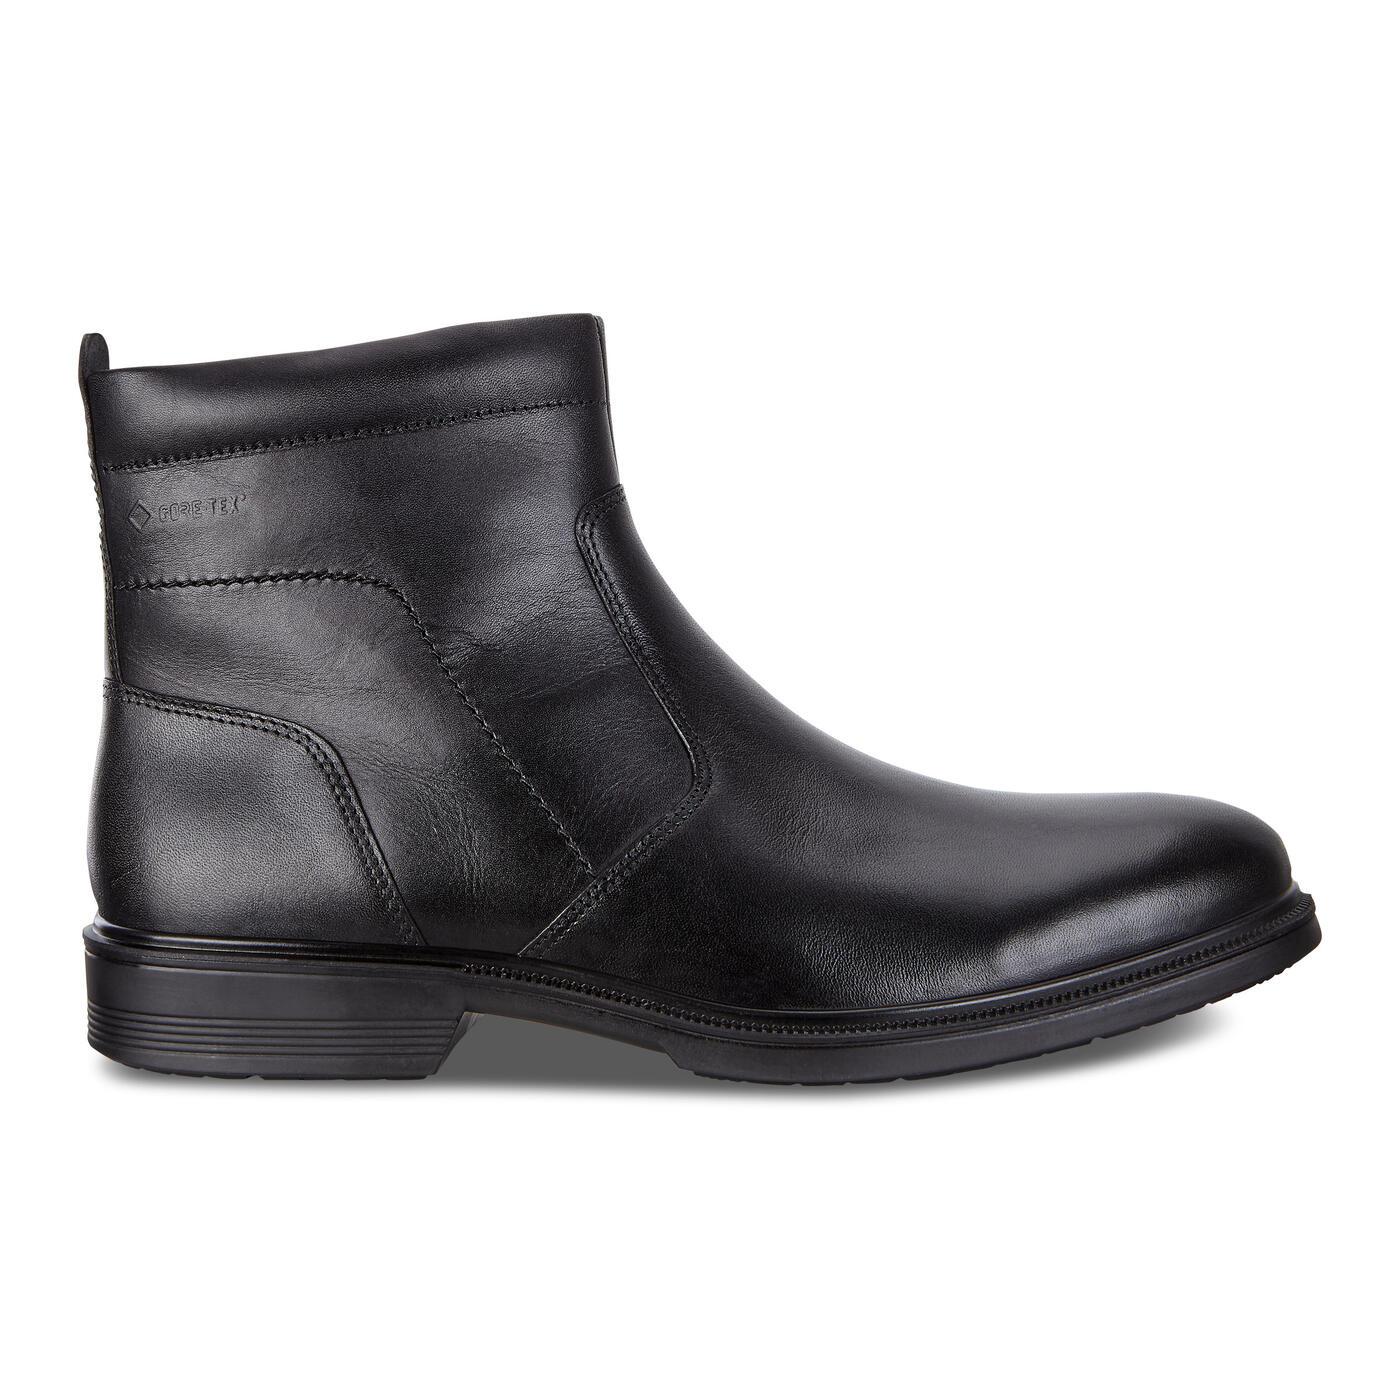 ECCO LISBON GTX Men's Ankle Boot